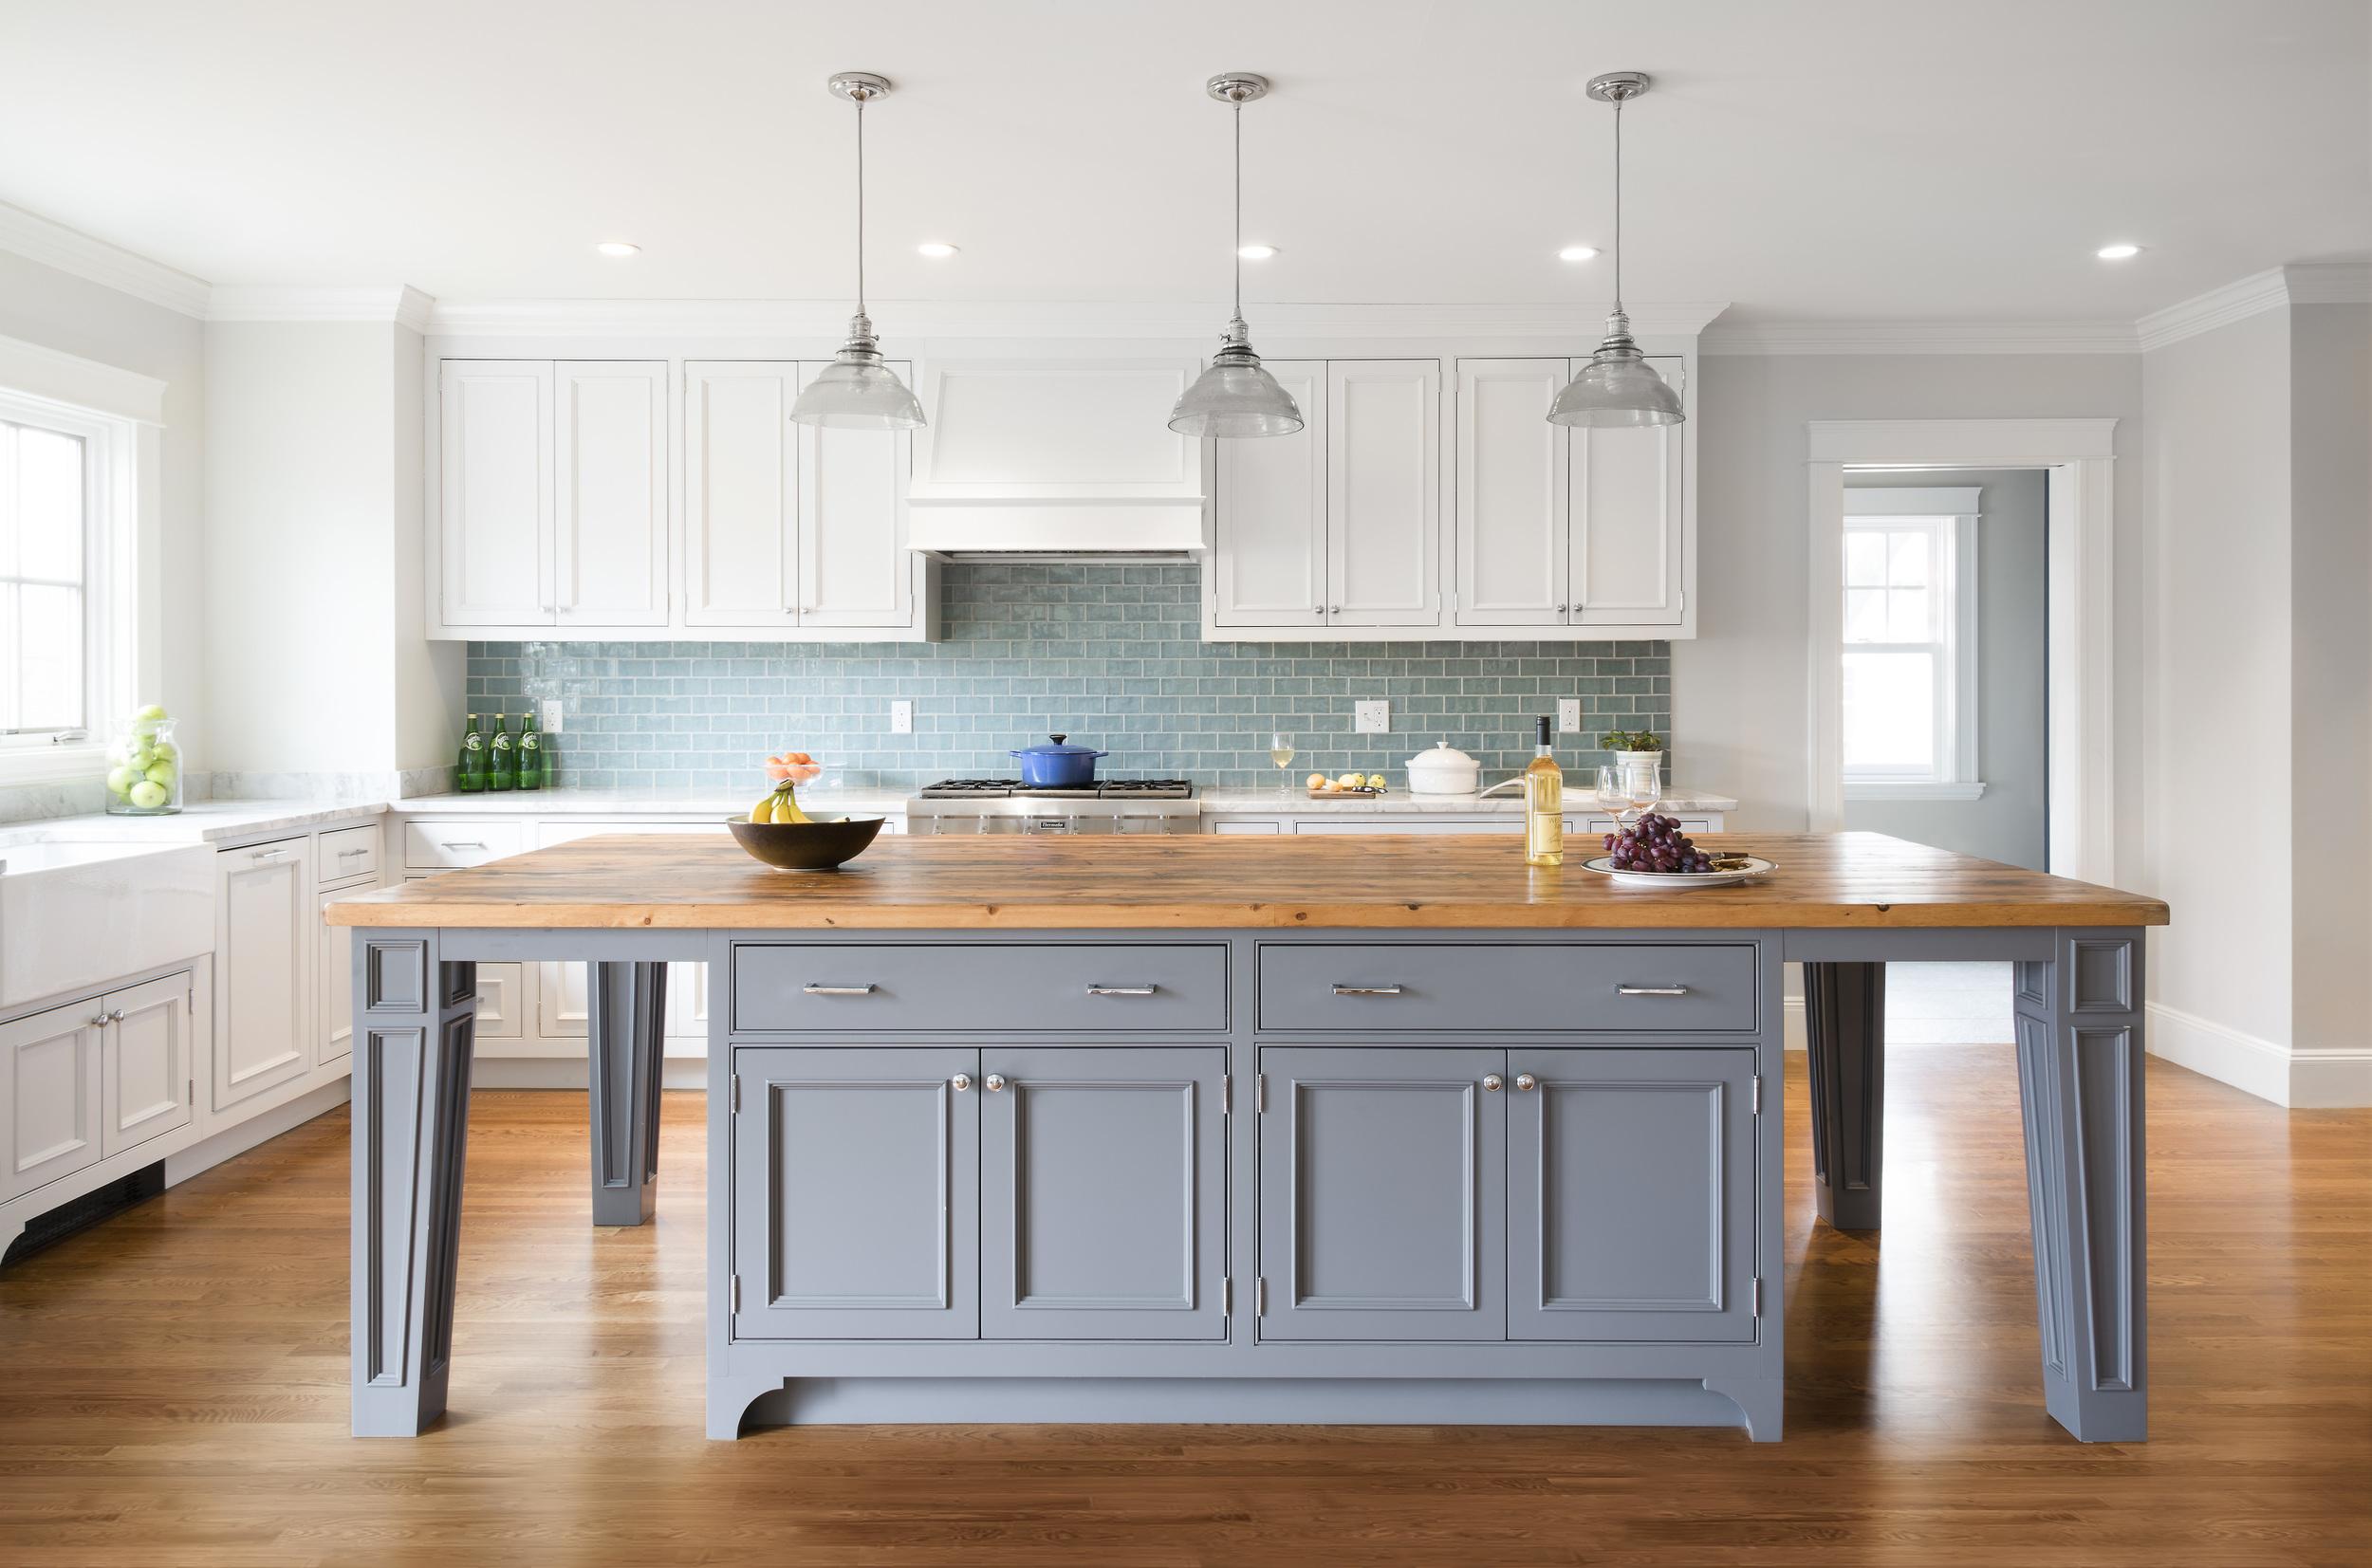 kitchenjillfinalprint copy.jpg